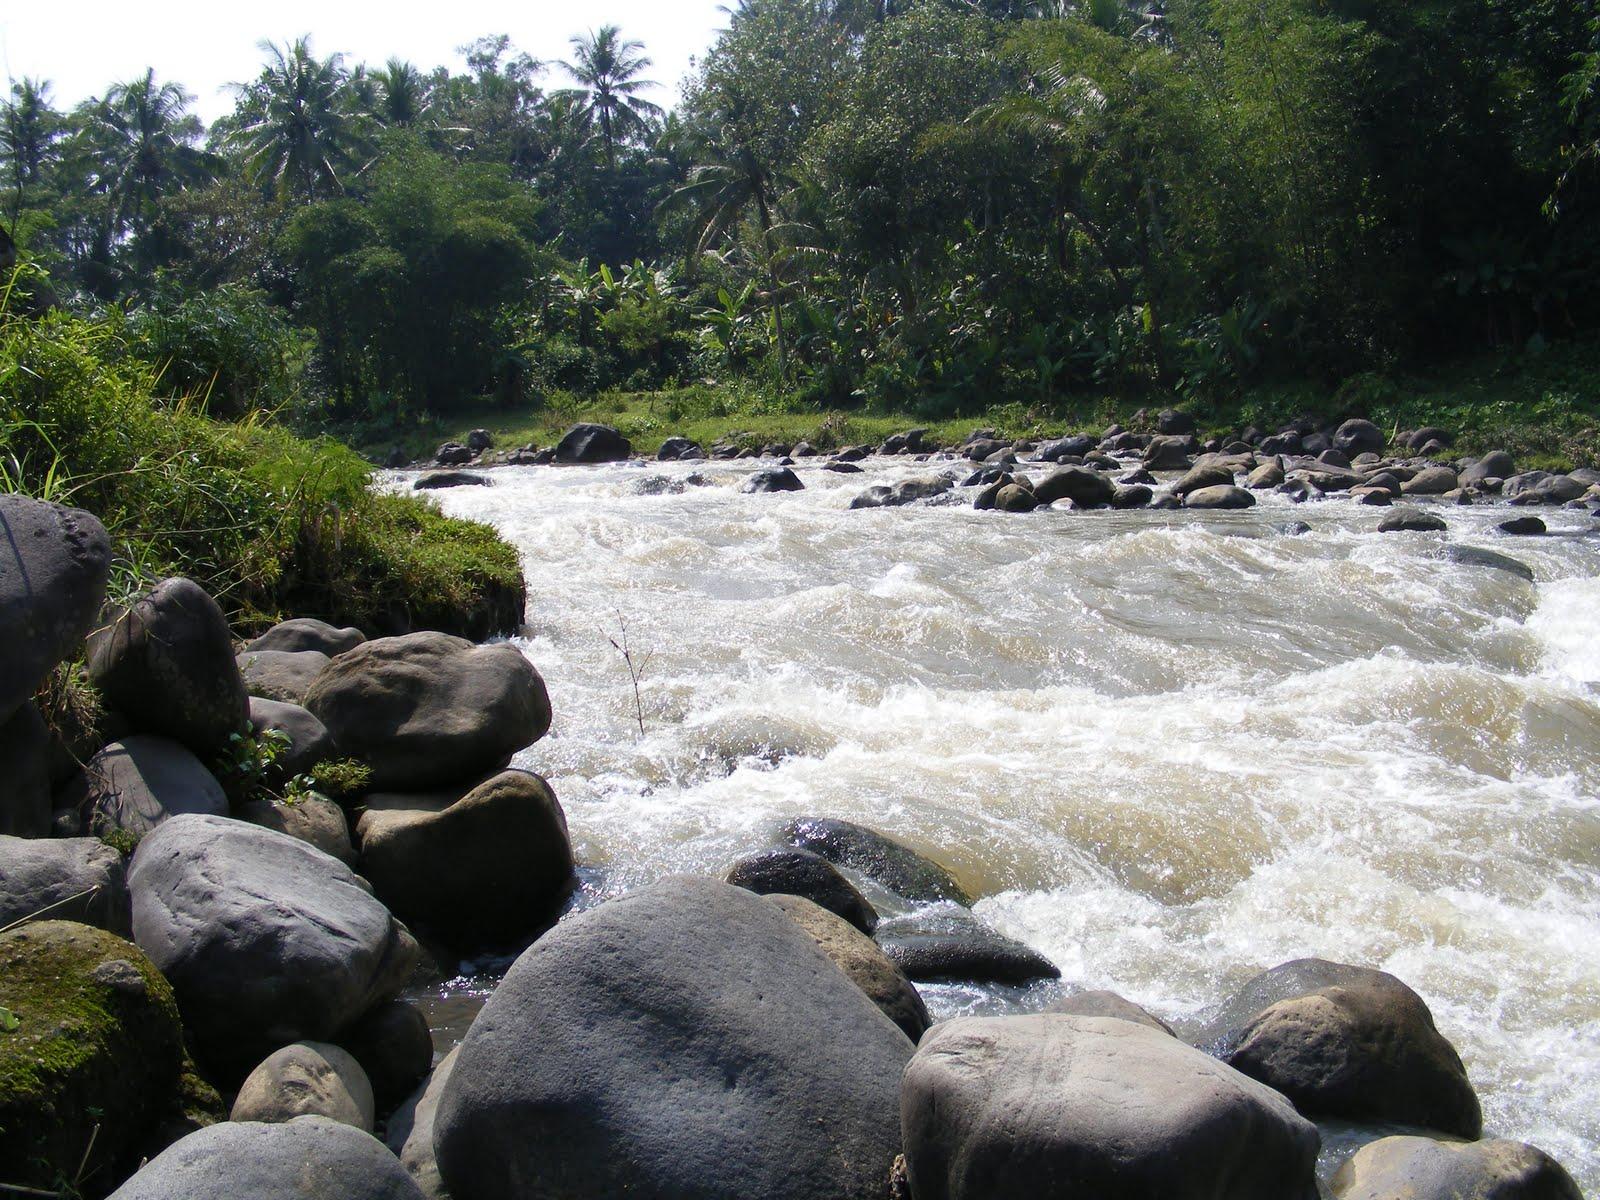 Sungai Elo Indonesia Nakarasido Hita Location River Excl Mendut Kab